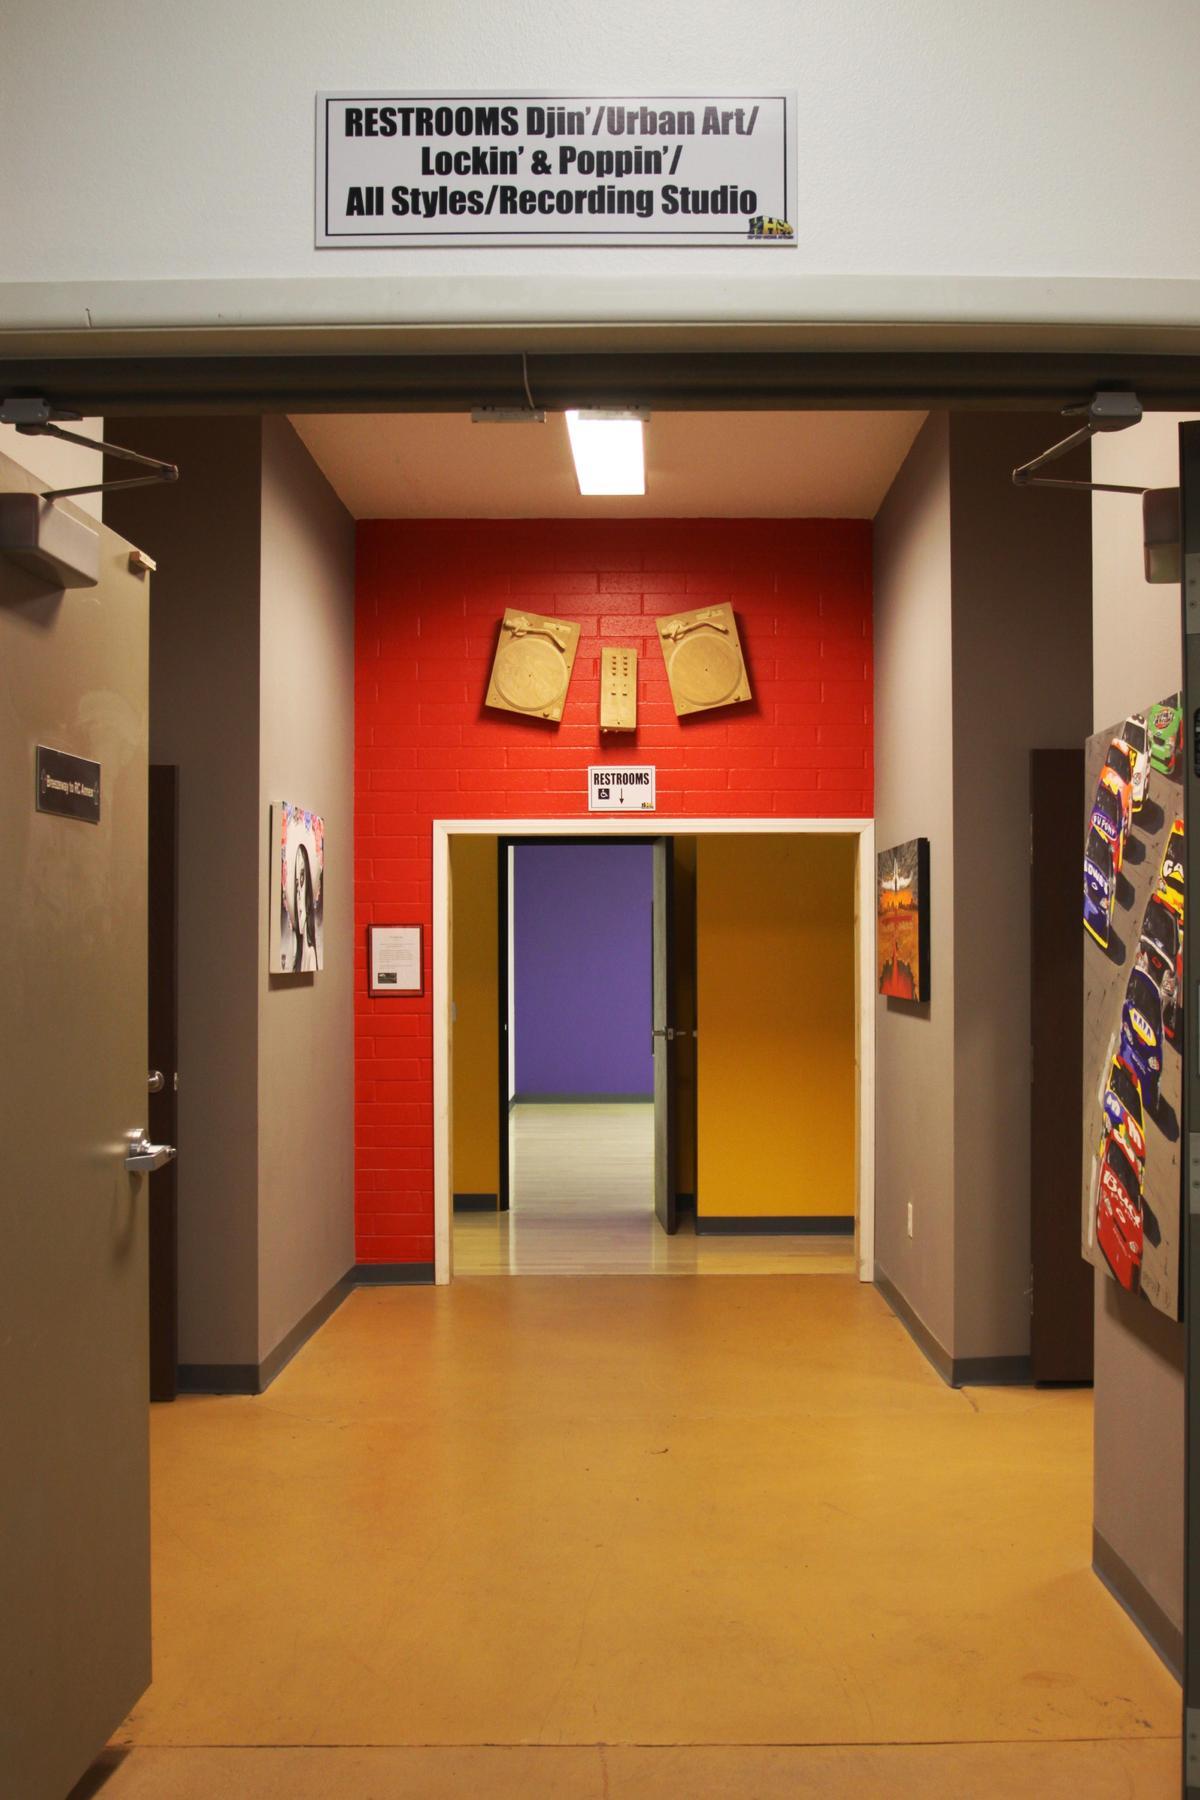 Hallway Entrance From Main Vestibule